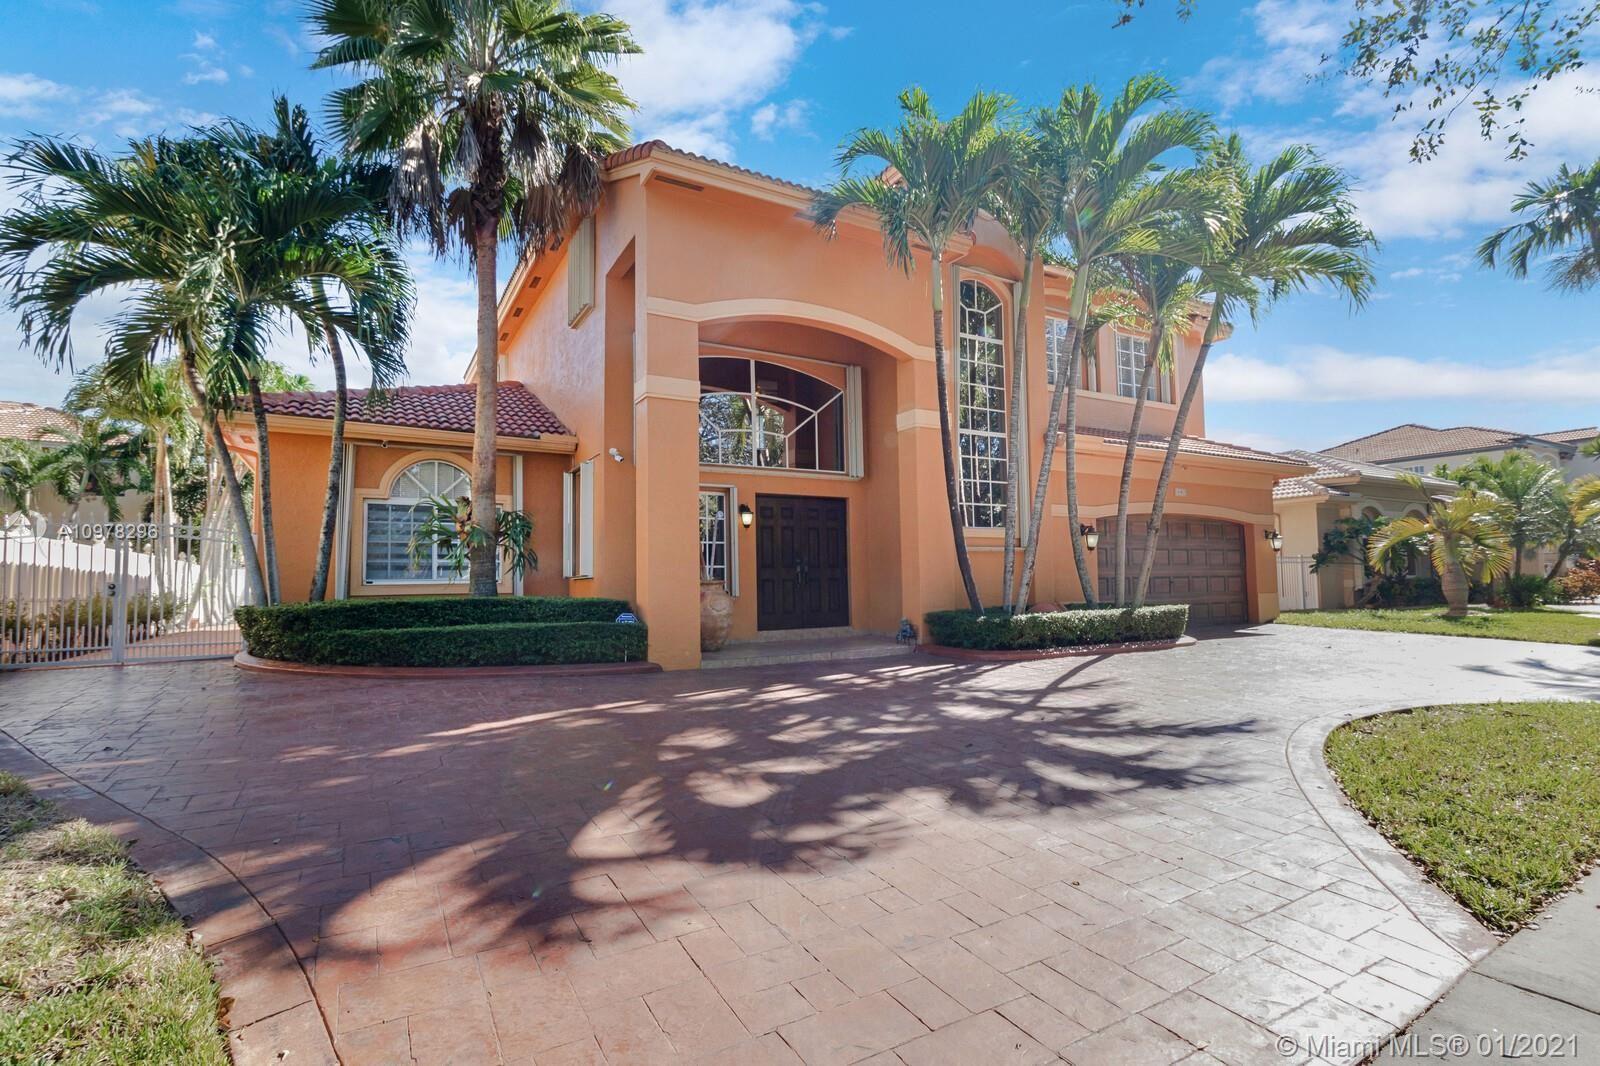 16905 NW 78th Ave, Miami Lakes, FL 33016 - #: A10978296